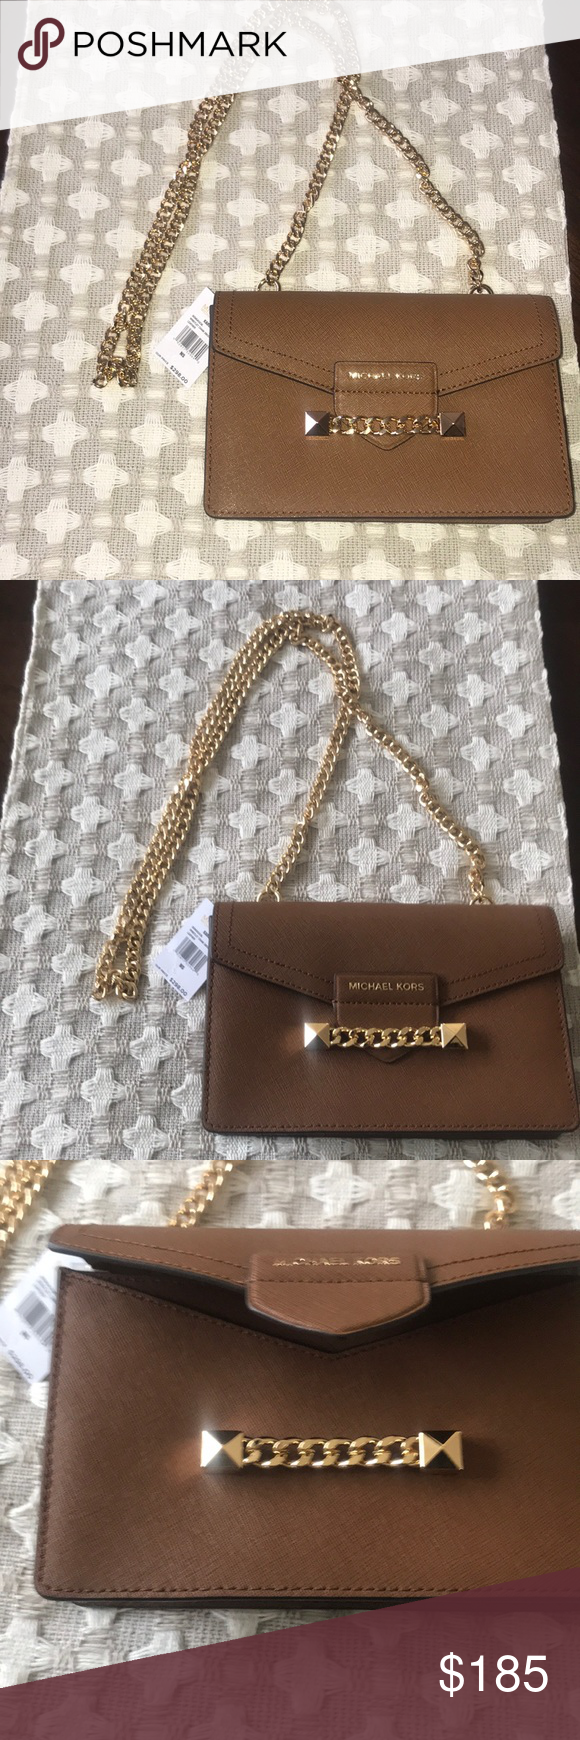 c9932f366fad NWT MK Karla Crossbody bag. Michael Kors. Karla, women's crossbody bag.  Brown